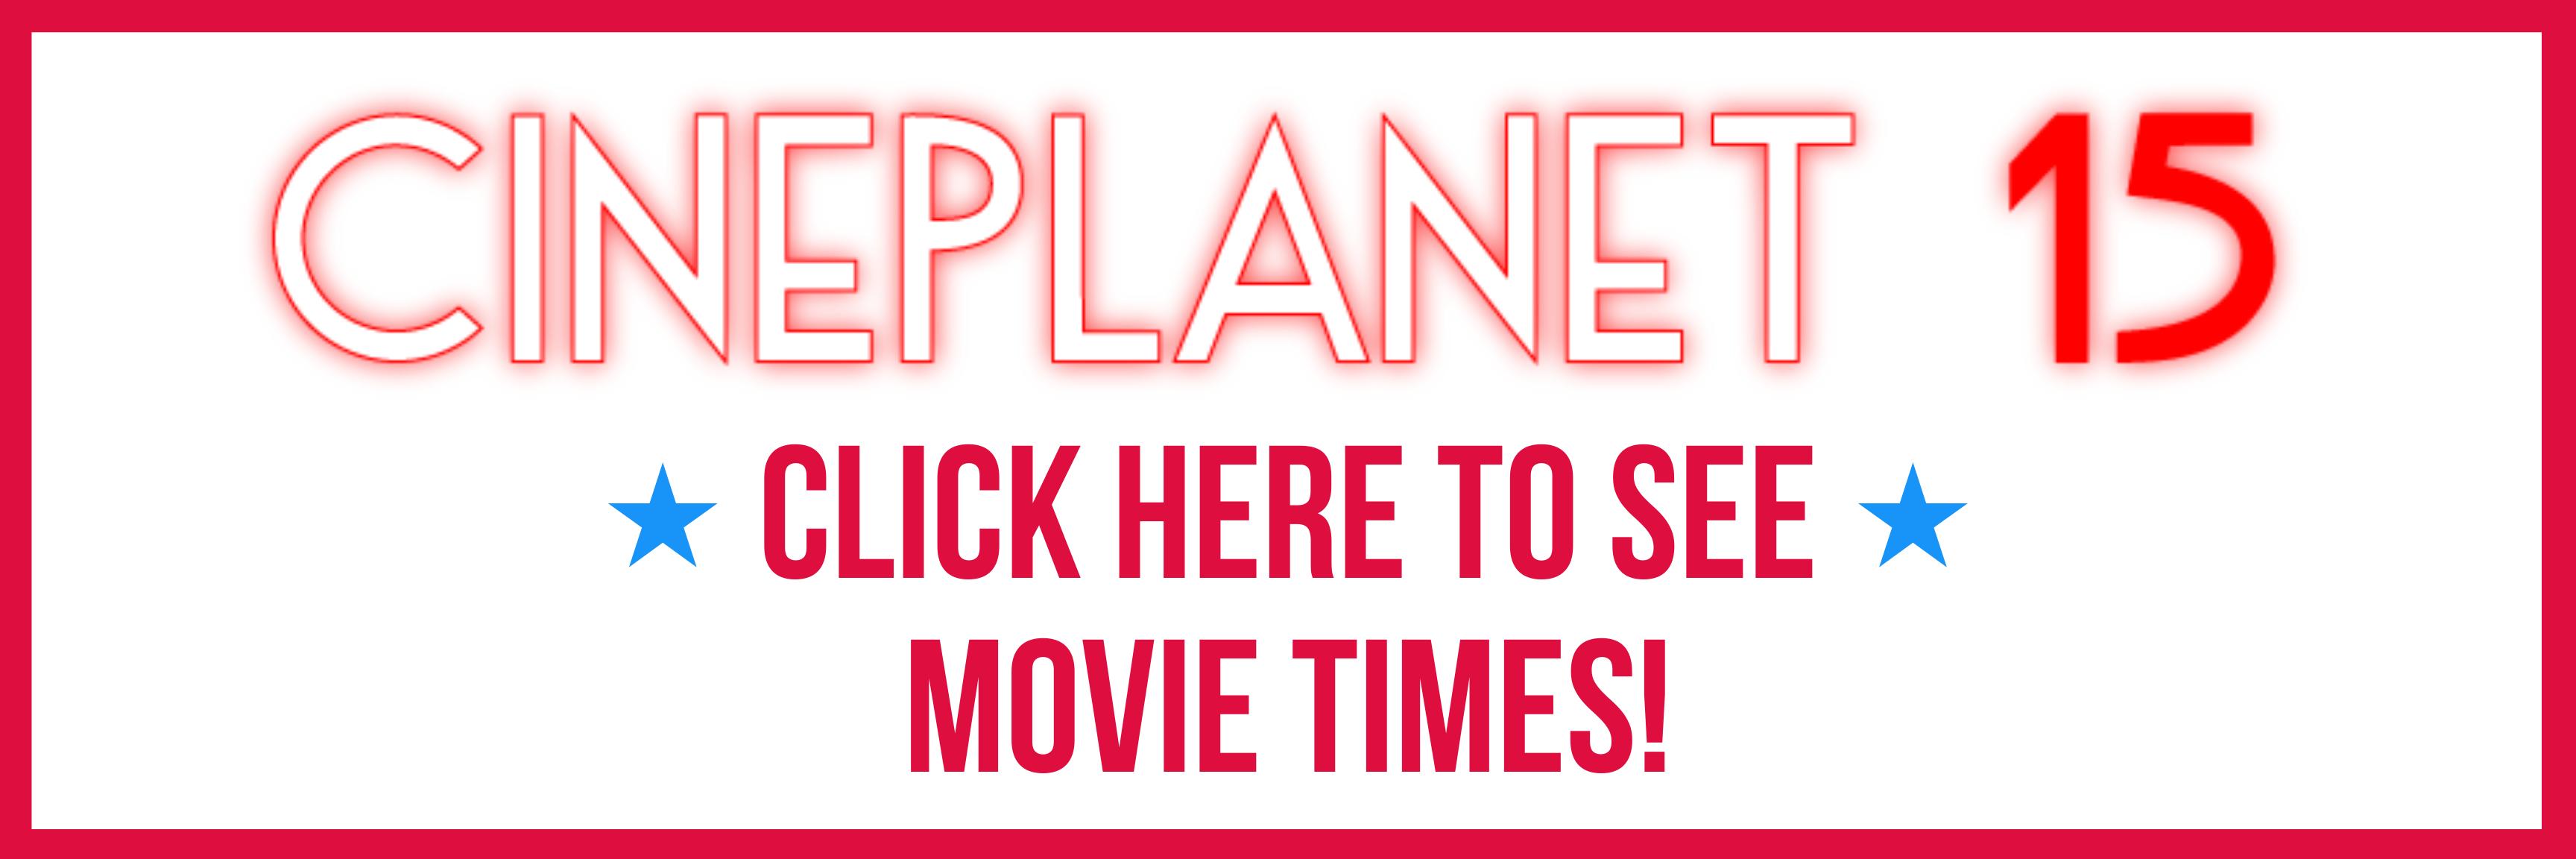 Cineplanet15